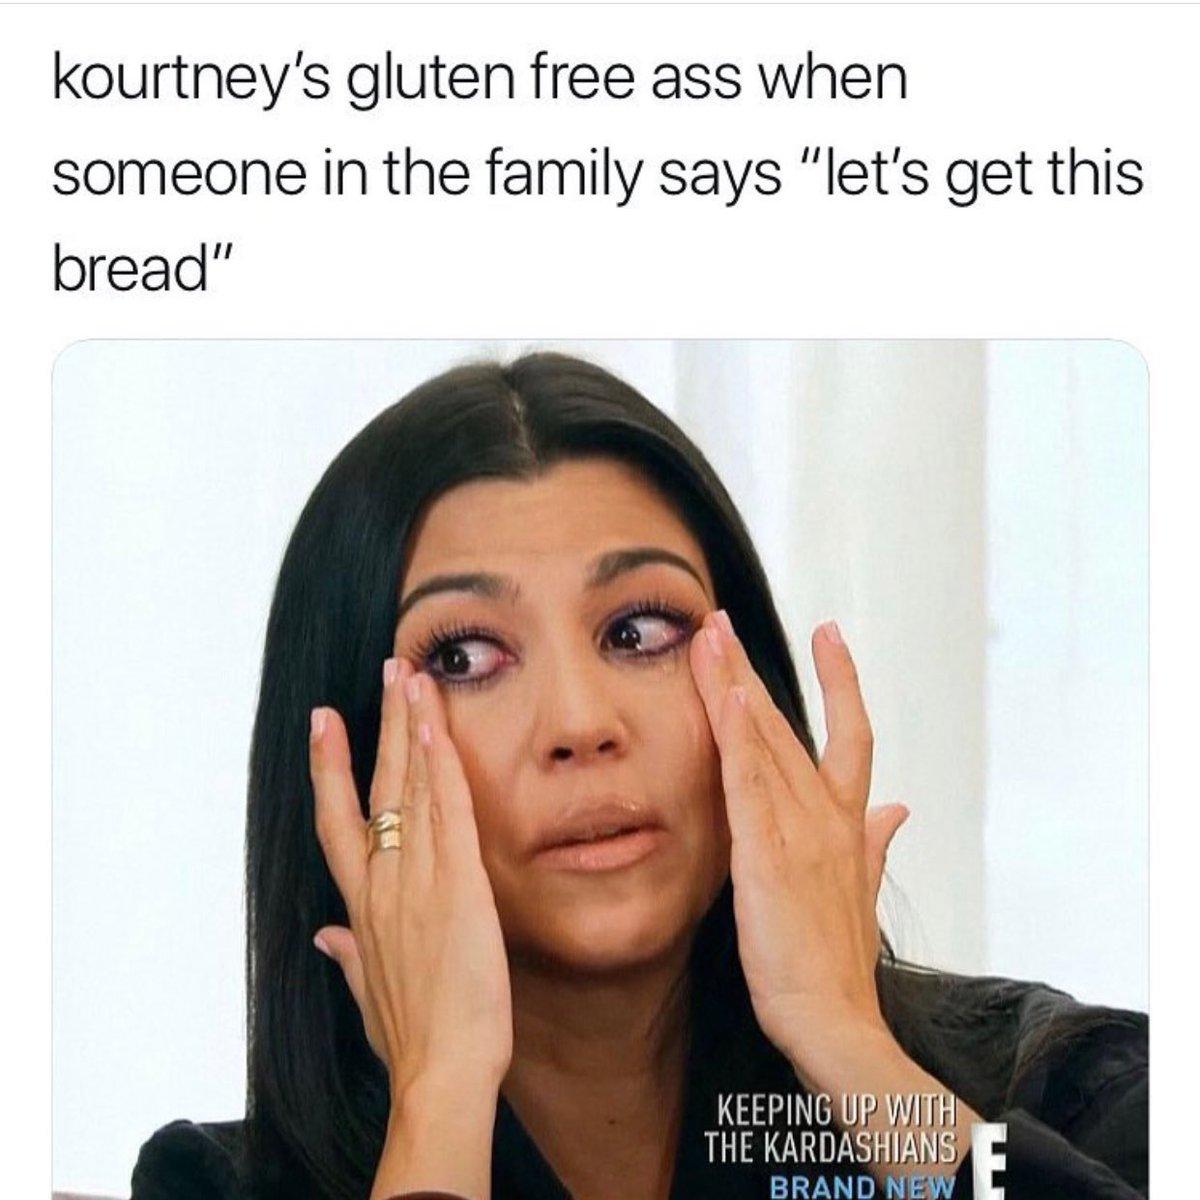 Kourtney Kardashian  - 😭😹 twitter @kourtneykardash